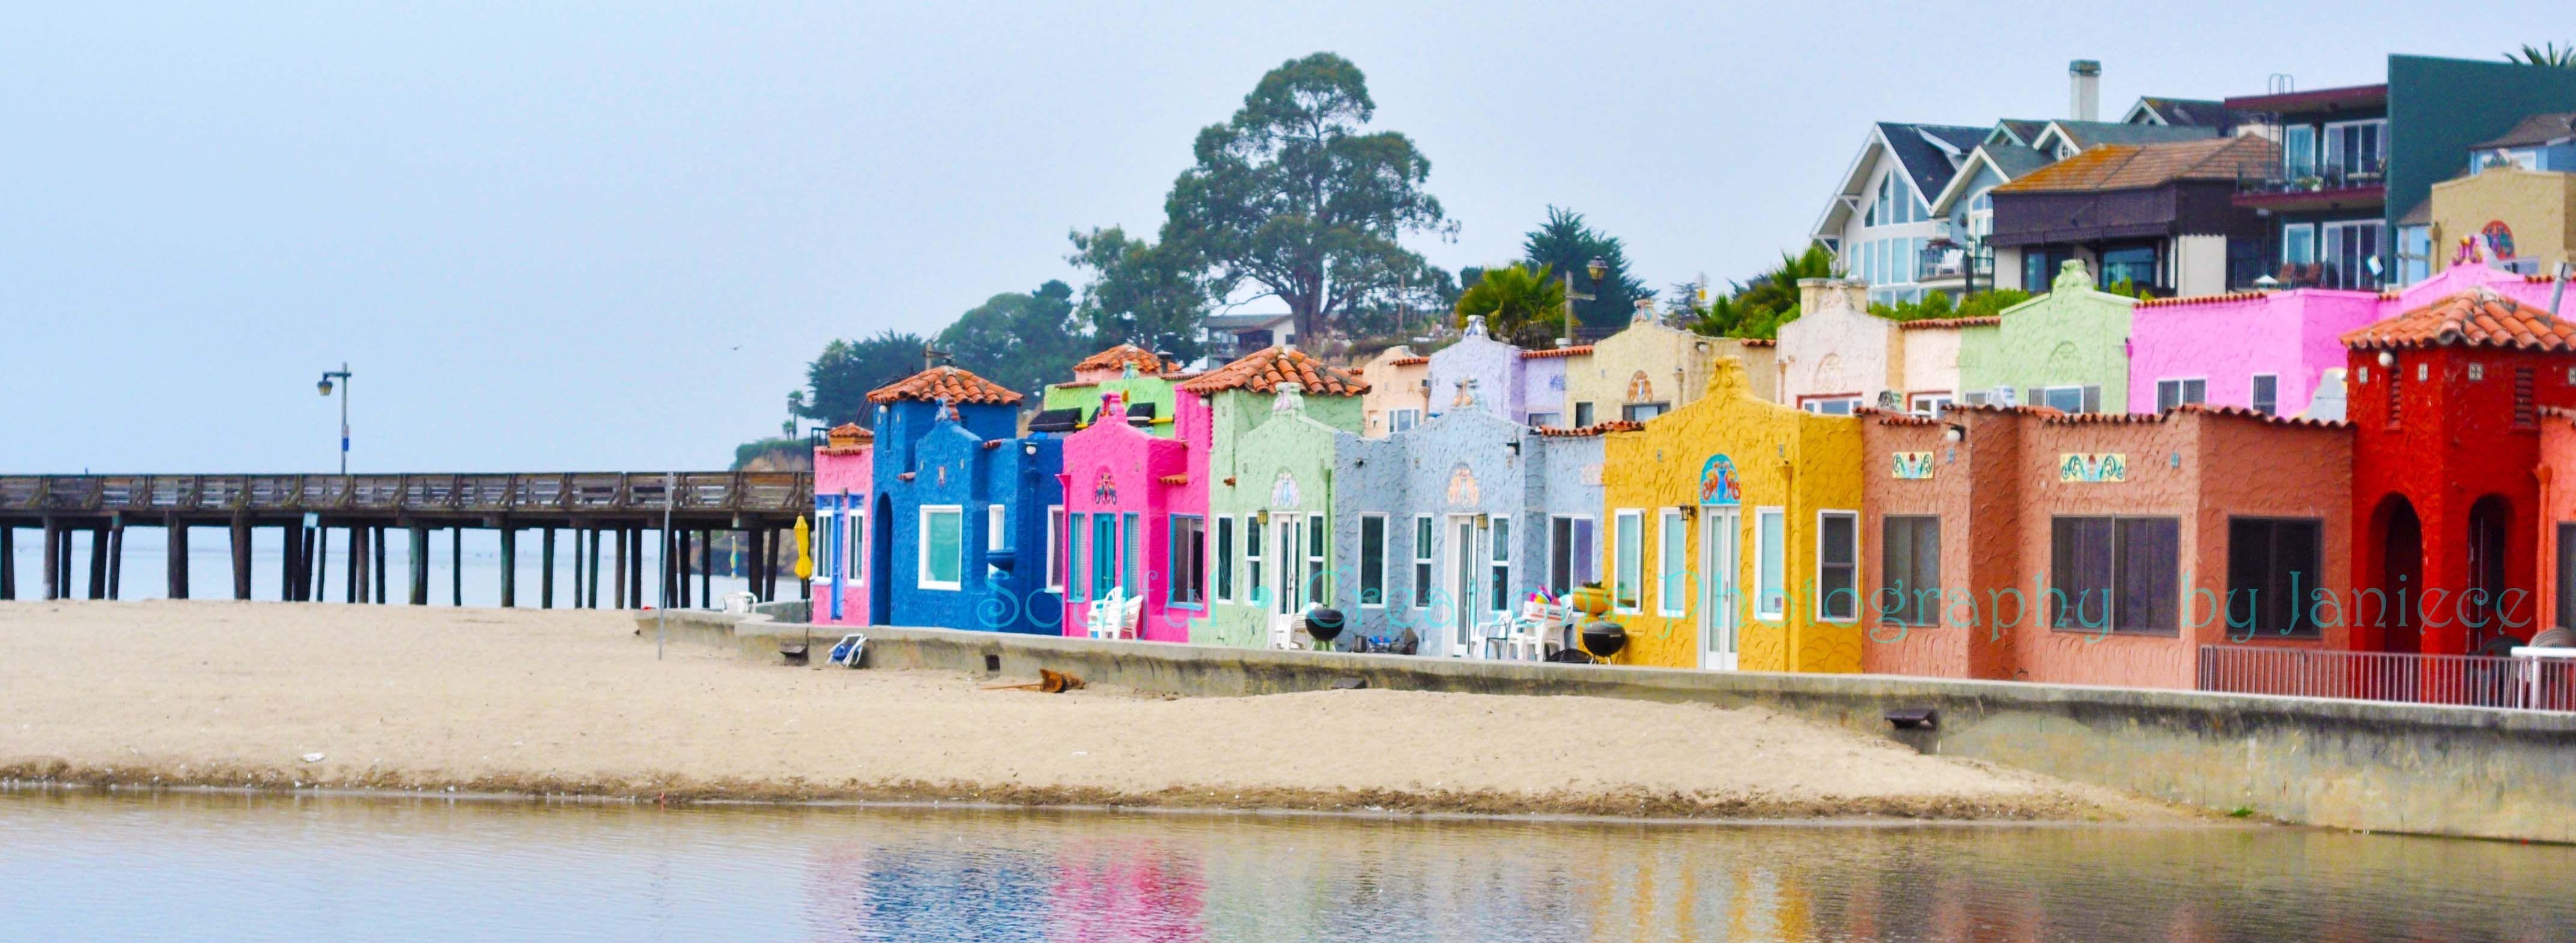 Capitola California Beach Houses Vibrant Senior Pictures